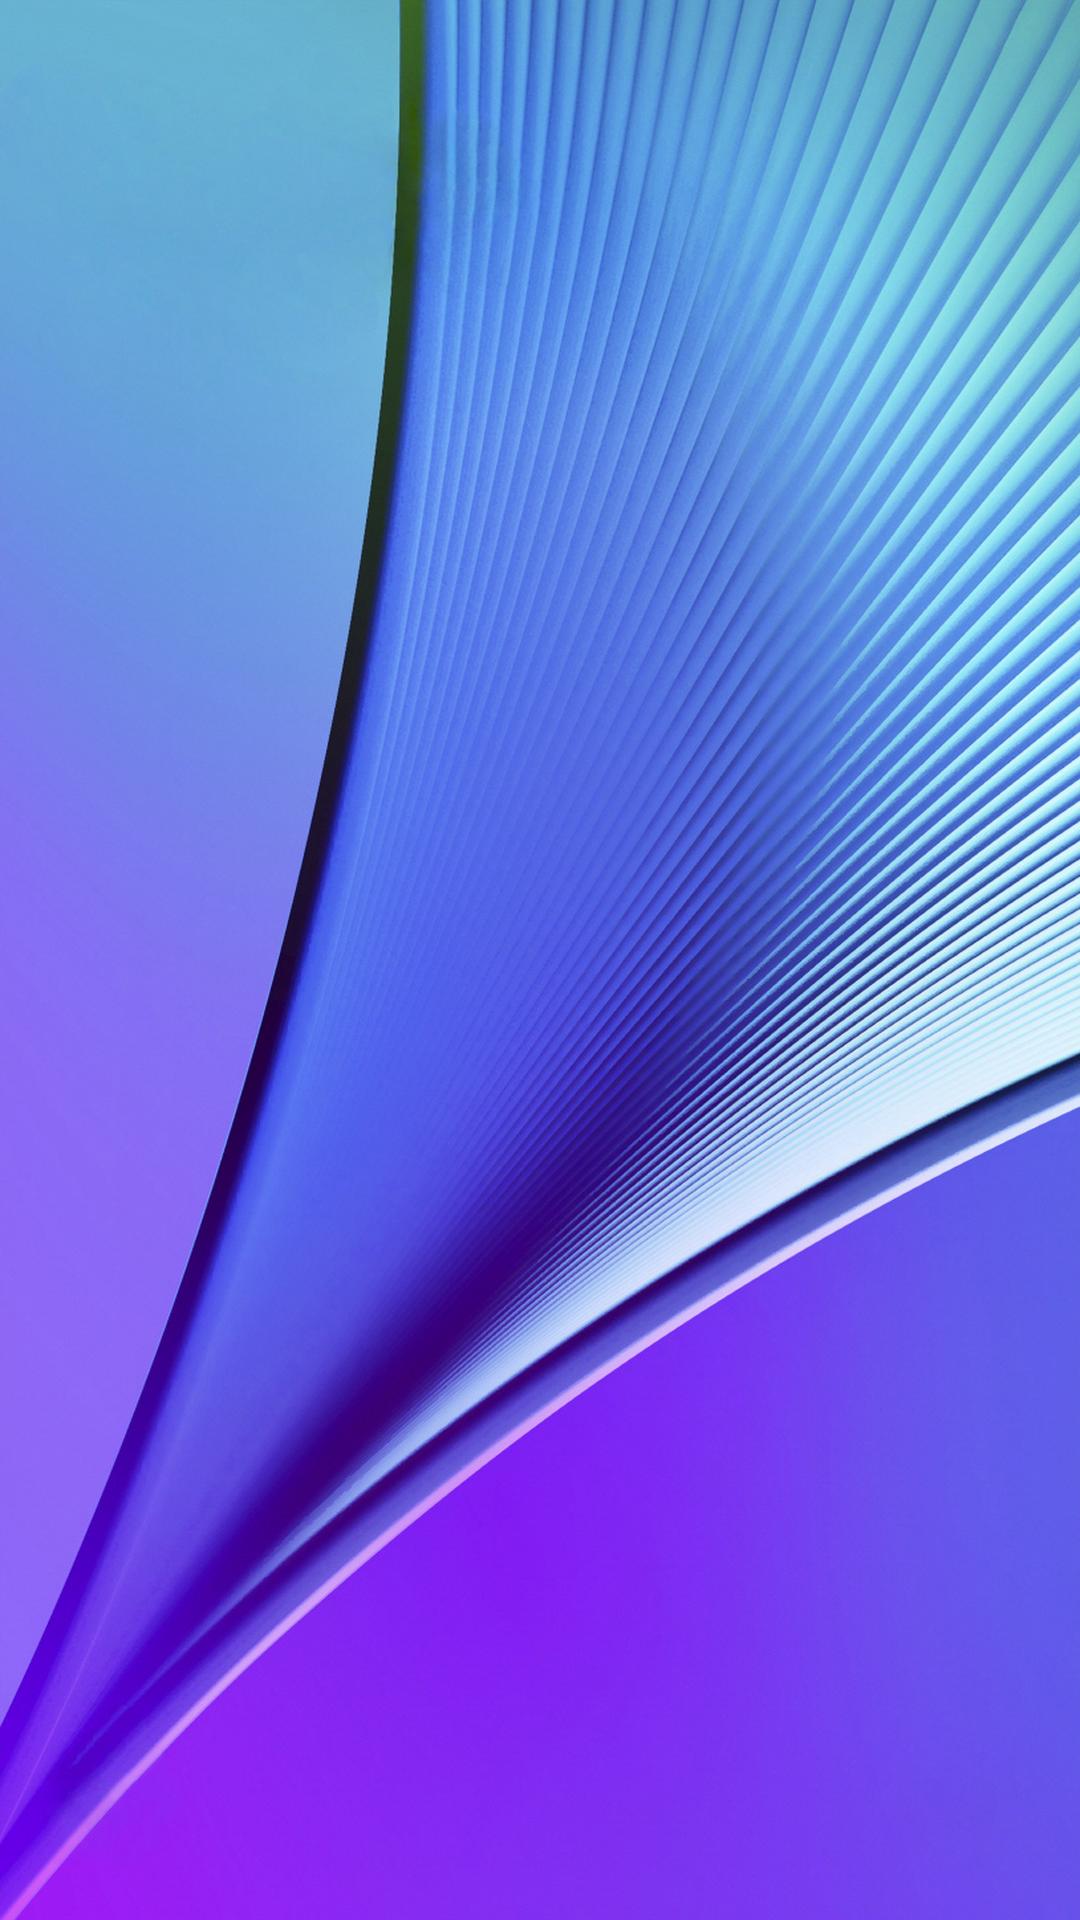 Samsung s6 edge live wallpaper download